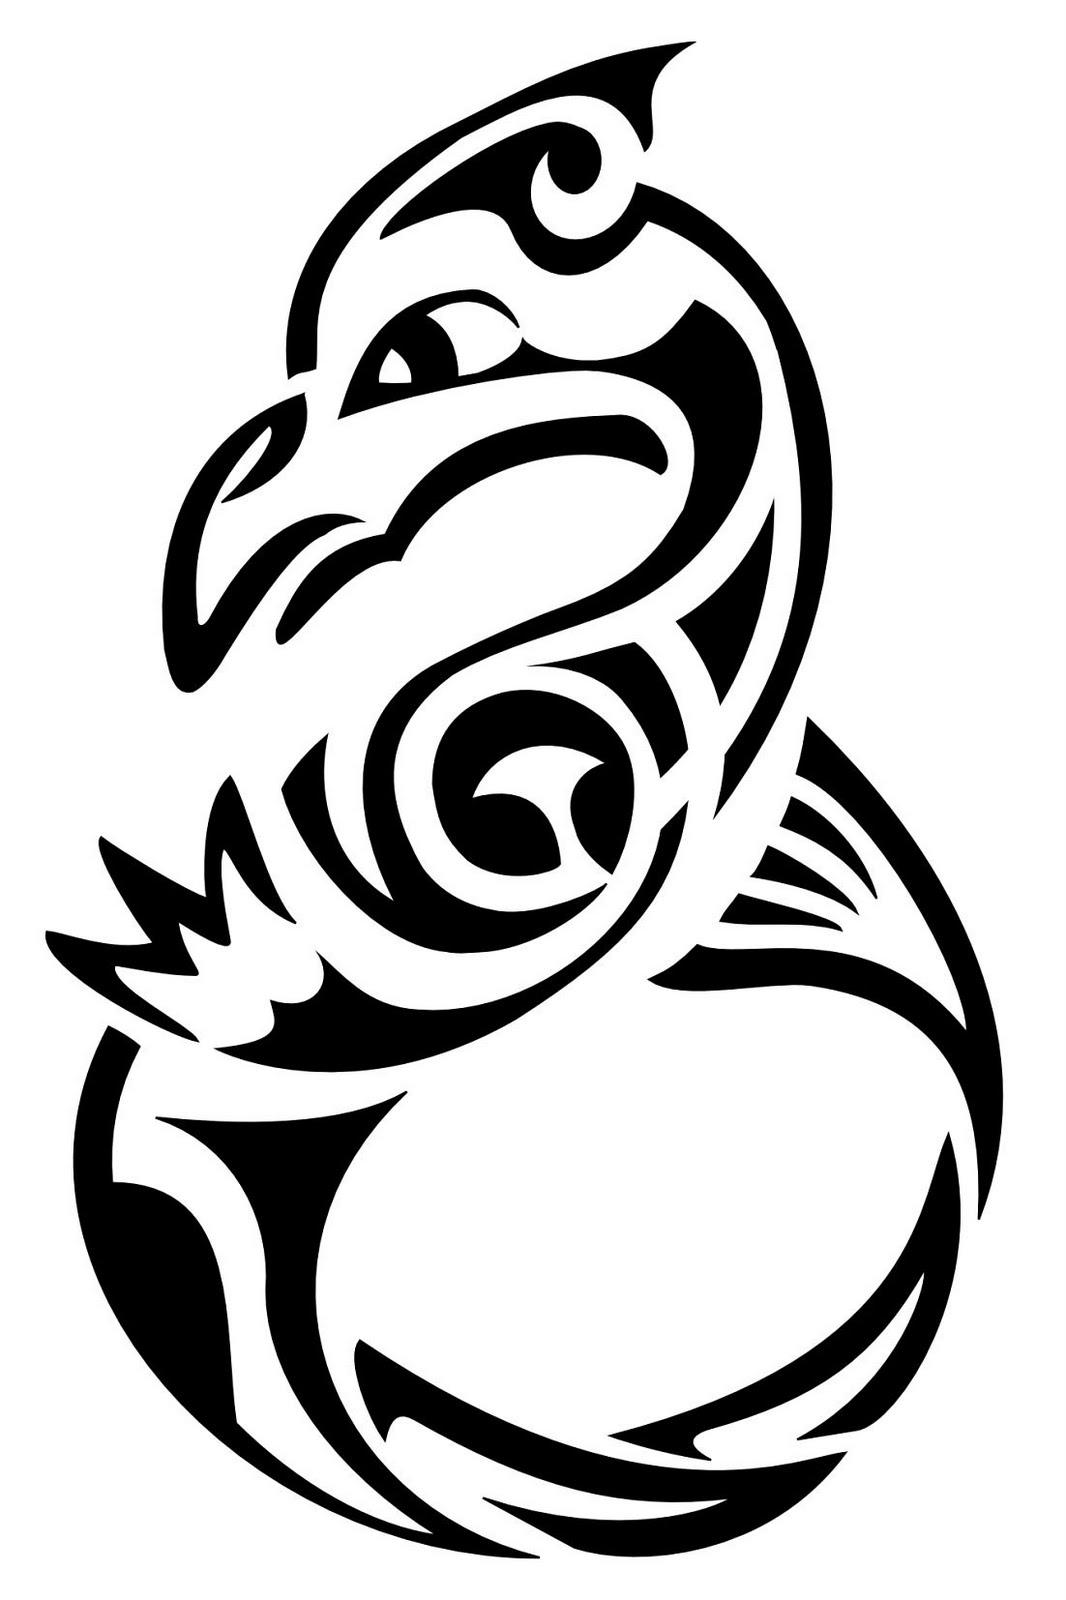 blu sky tattoo studio maori significato 272. Black Bedroom Furniture Sets. Home Design Ideas